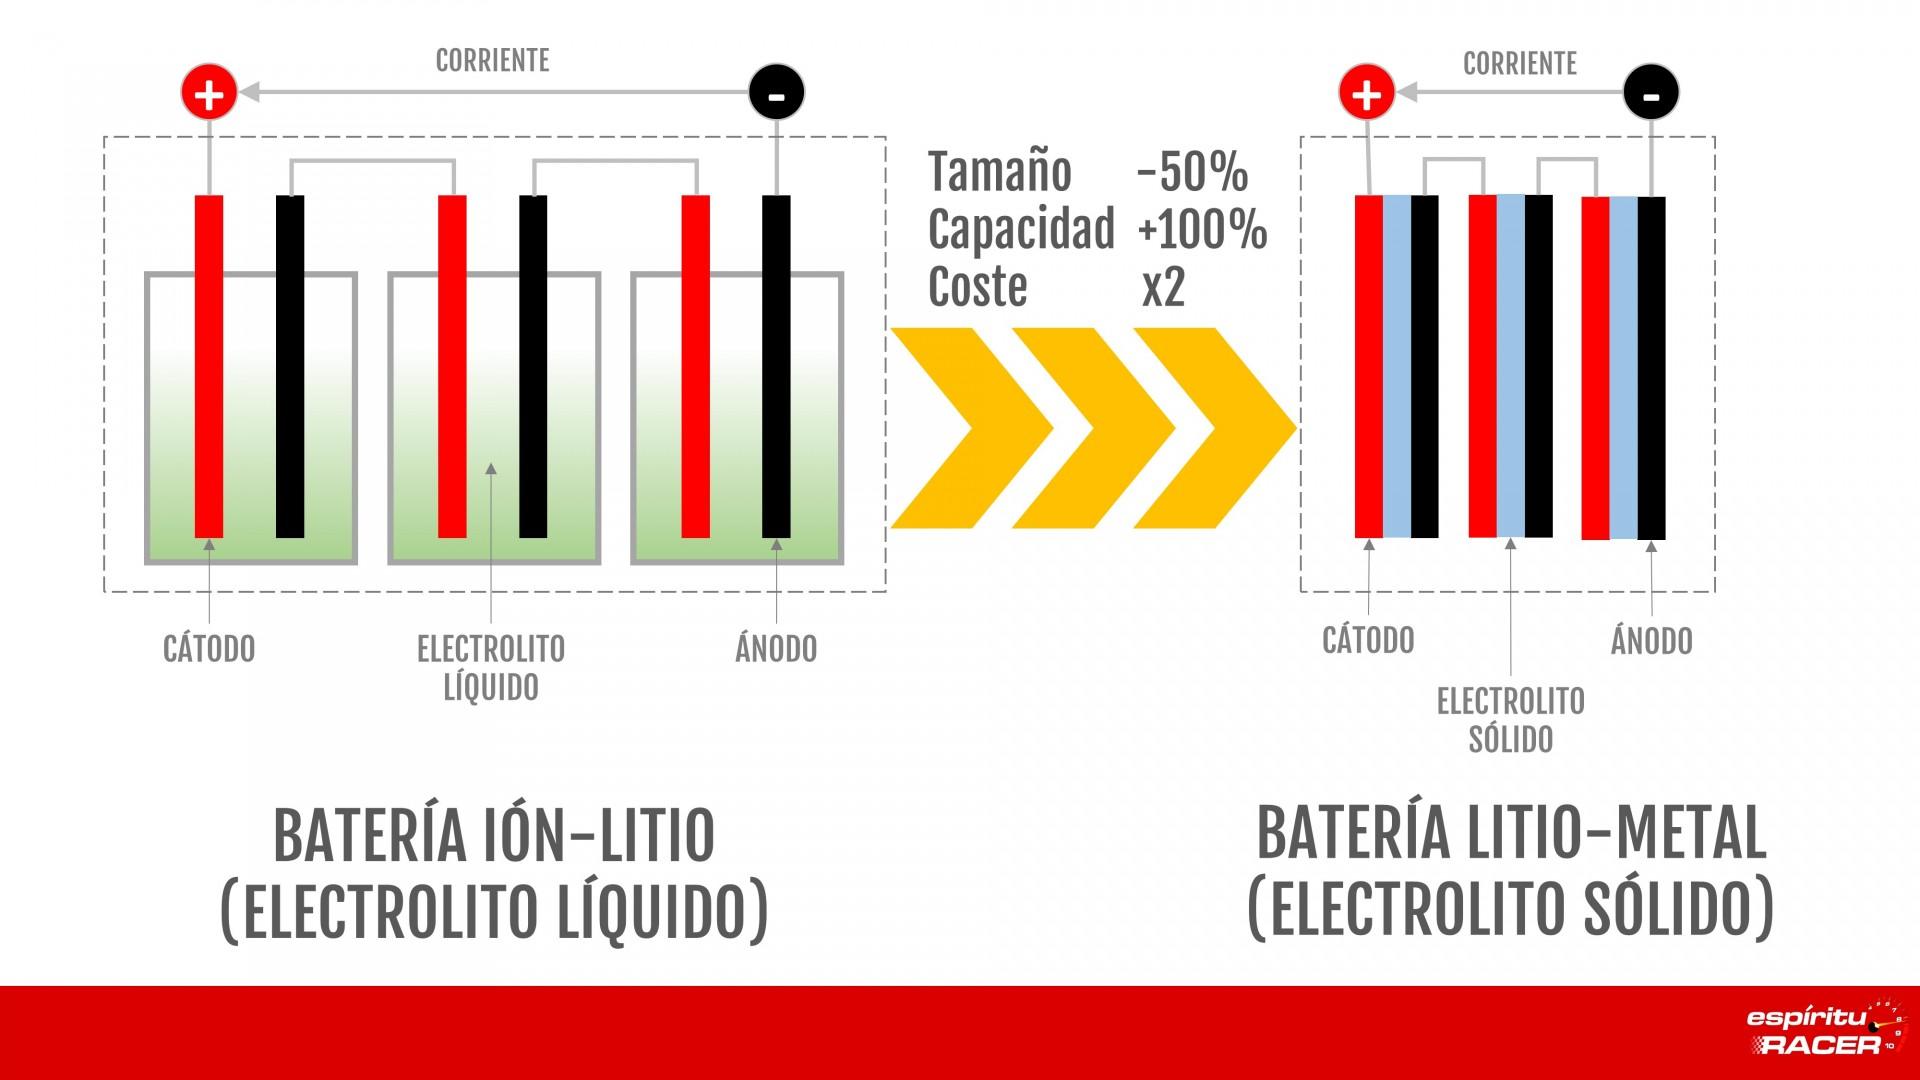 Batería Estado Solido V1